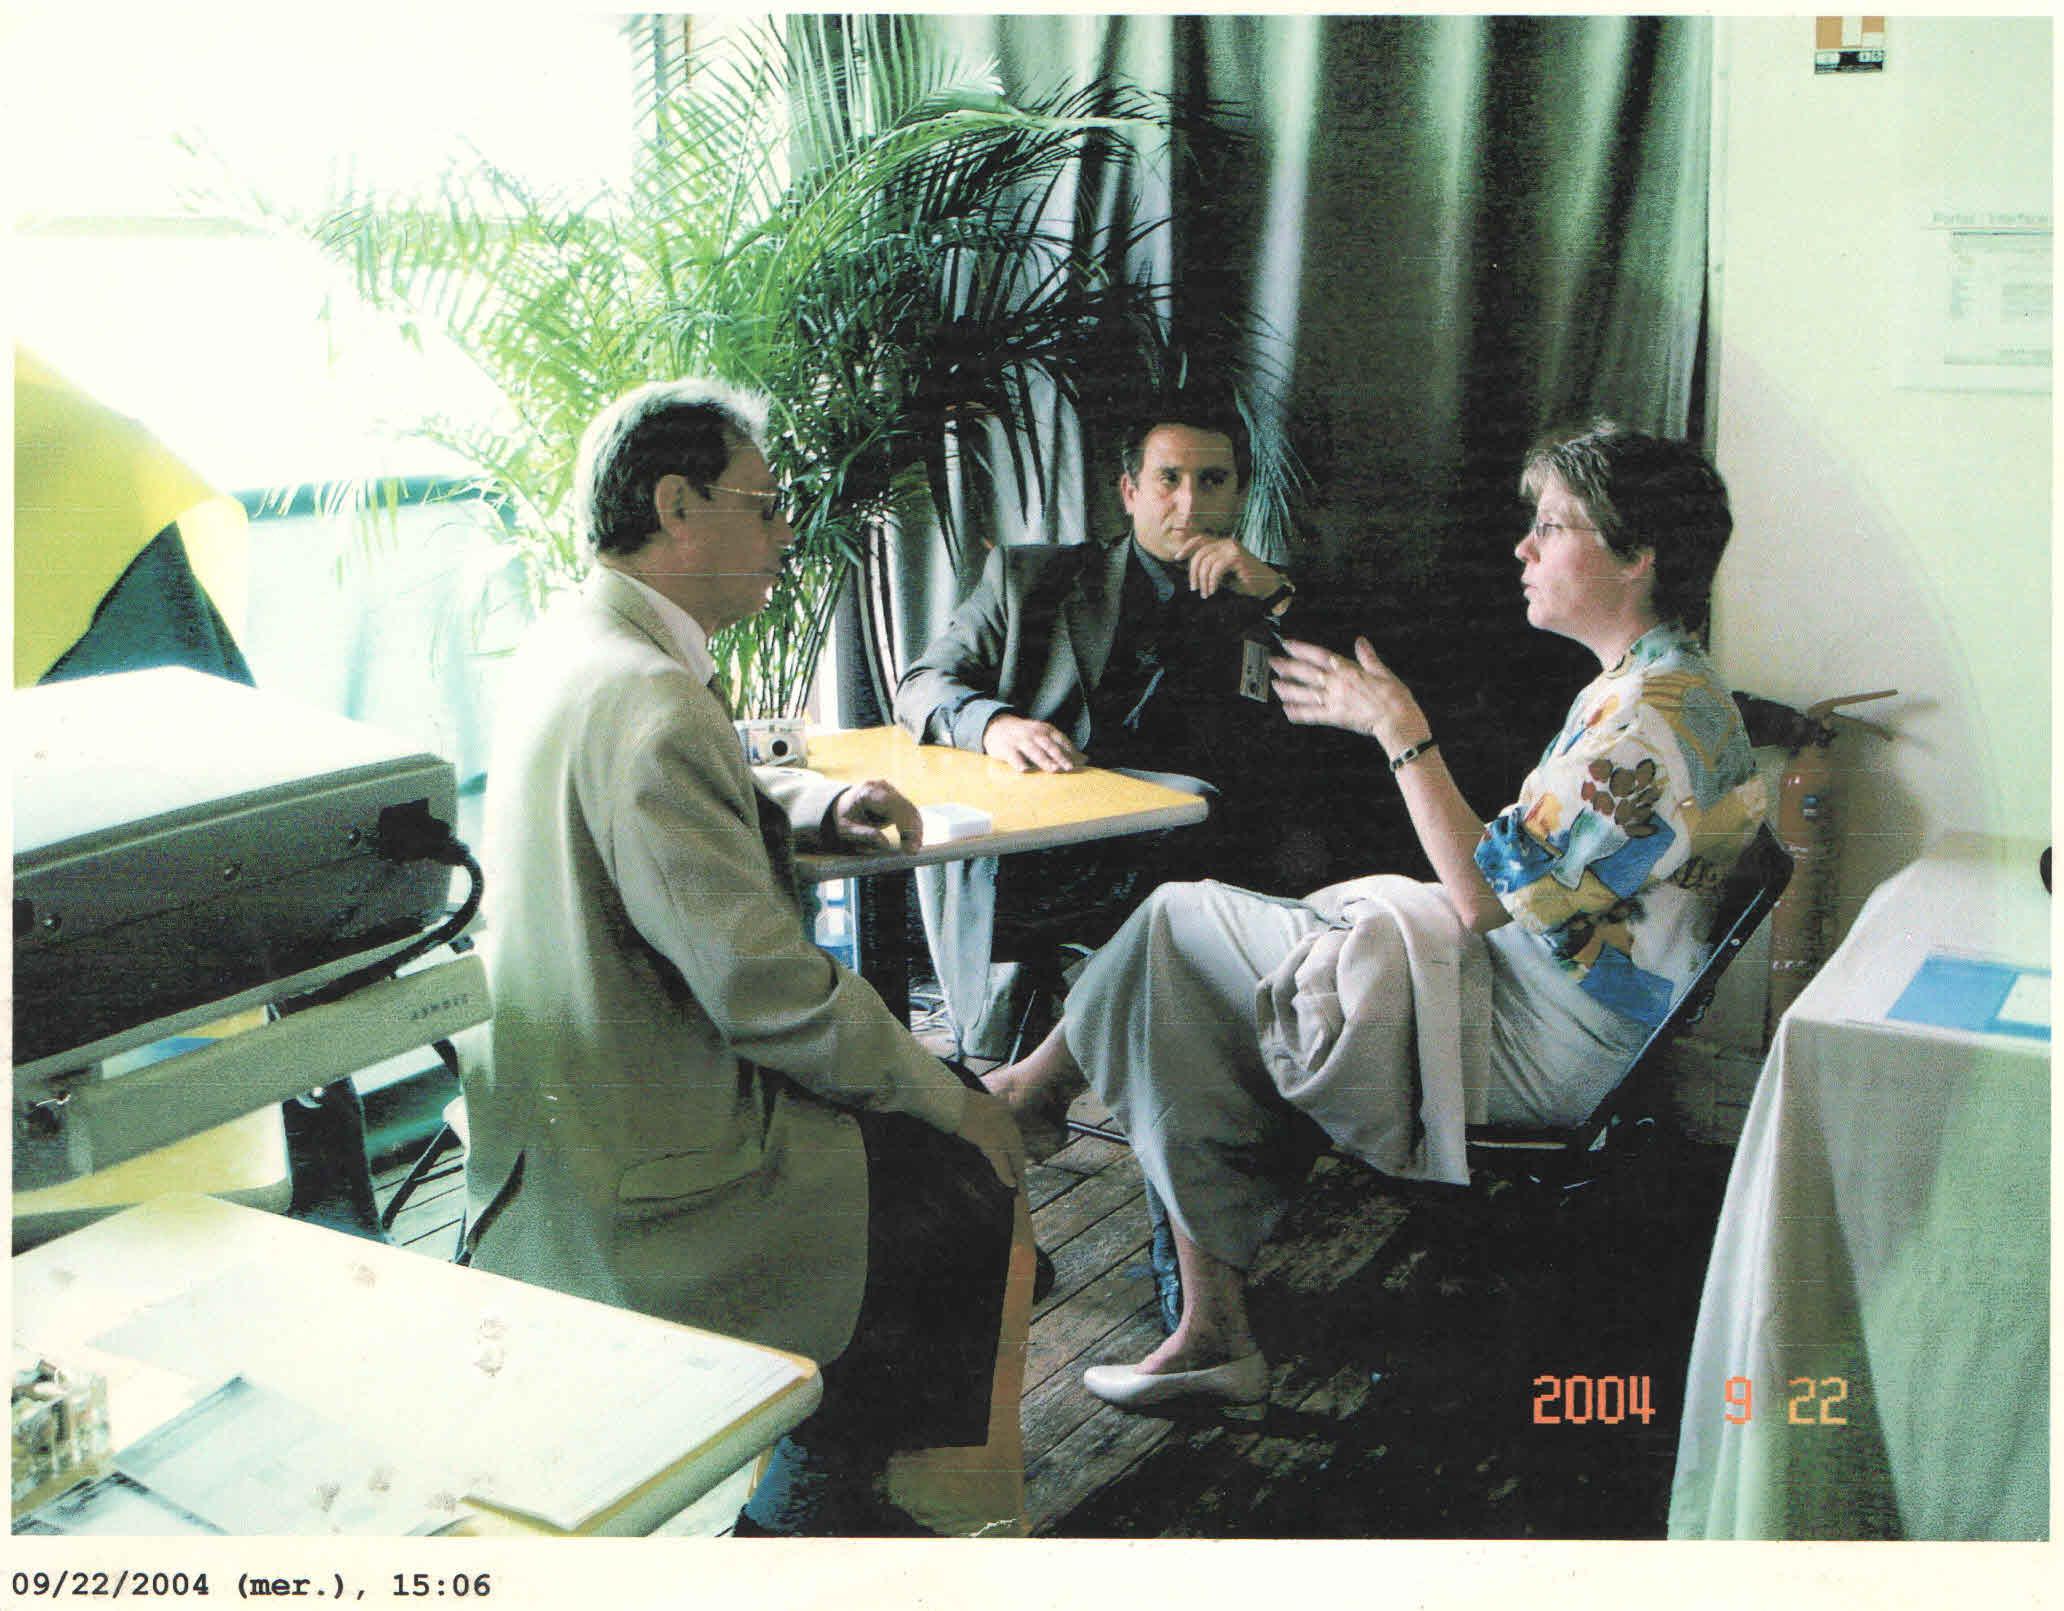 Joseph Irani et Martina Kost en discussion